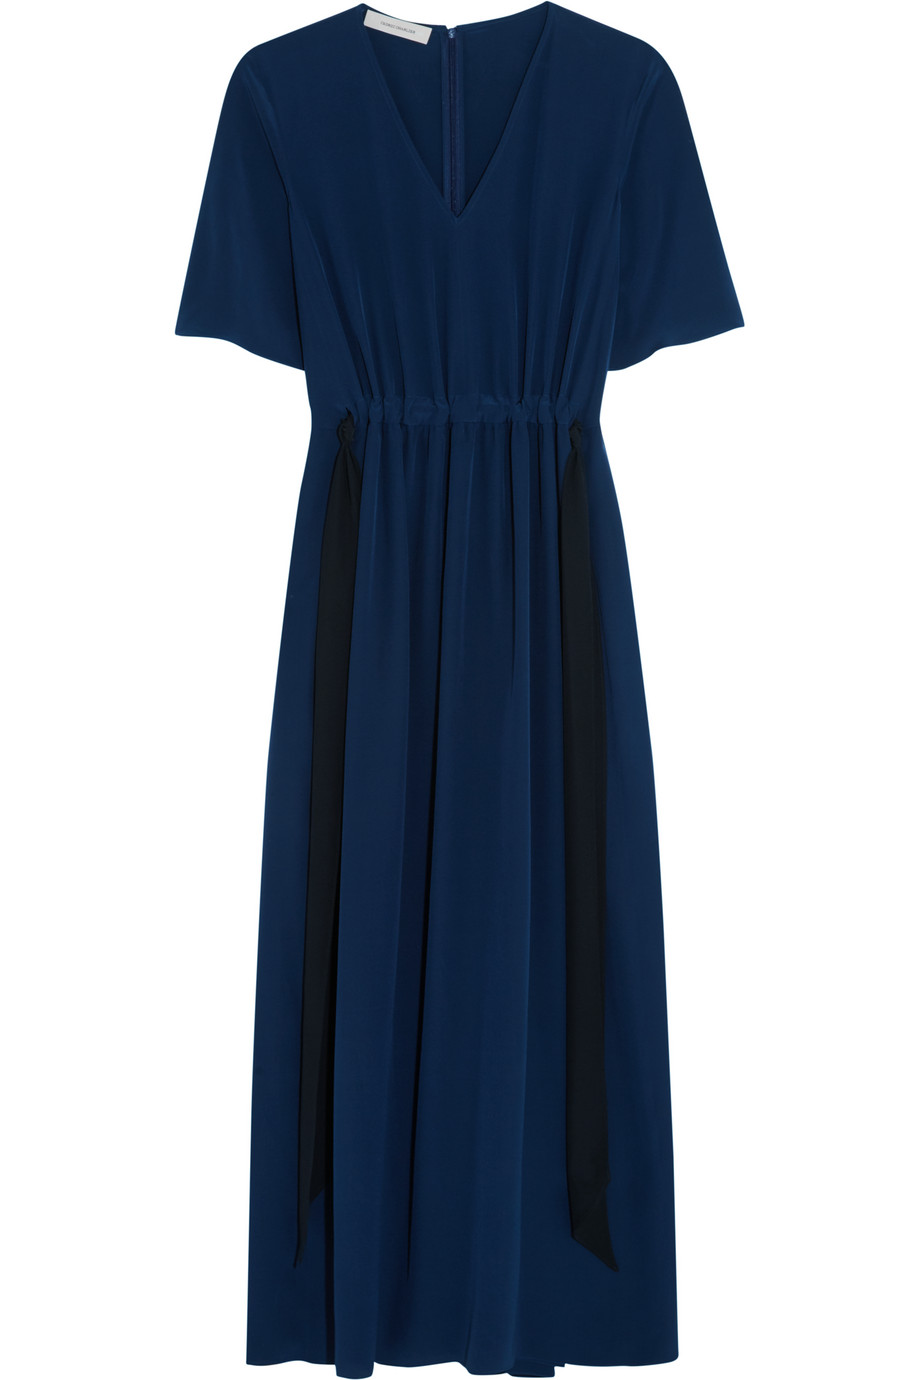 Cédric Charlier Washed-Silk Dress, Navy, Women's, Size: 38